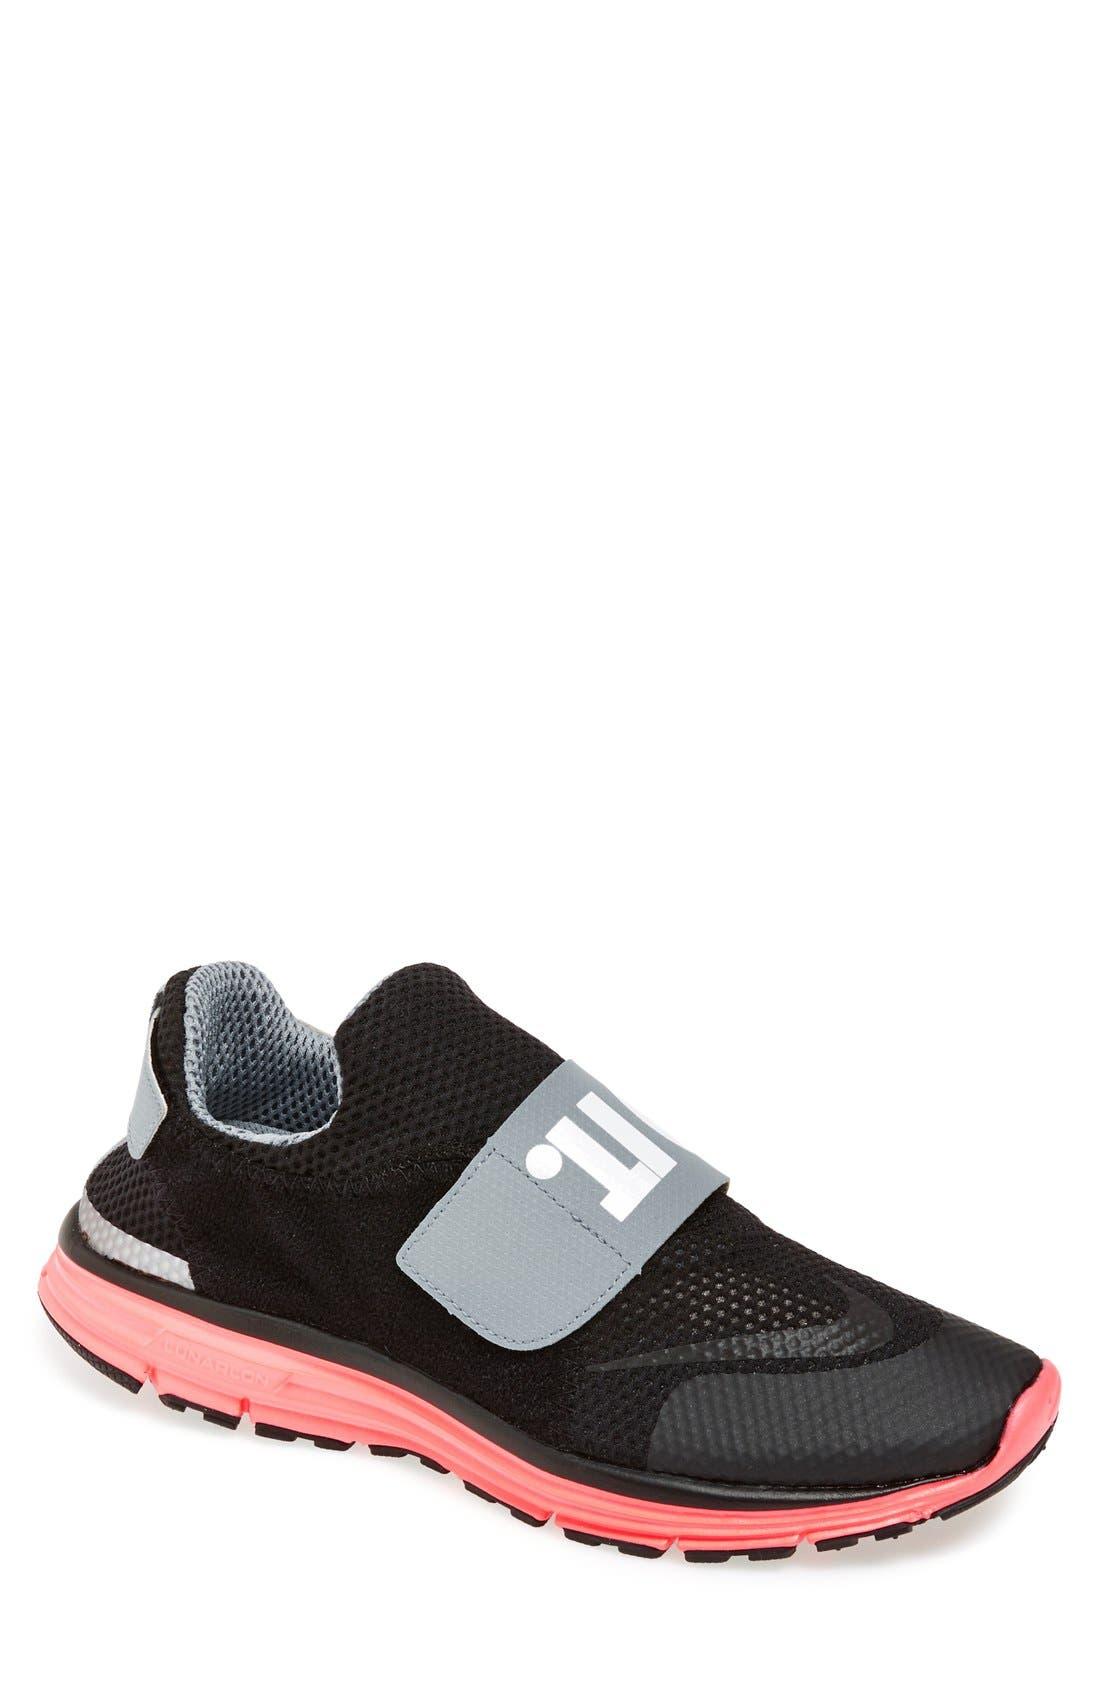 Nike Lunaire Voler 306 Femmes Maillots De Bain offres de liquidation DMfor9elf